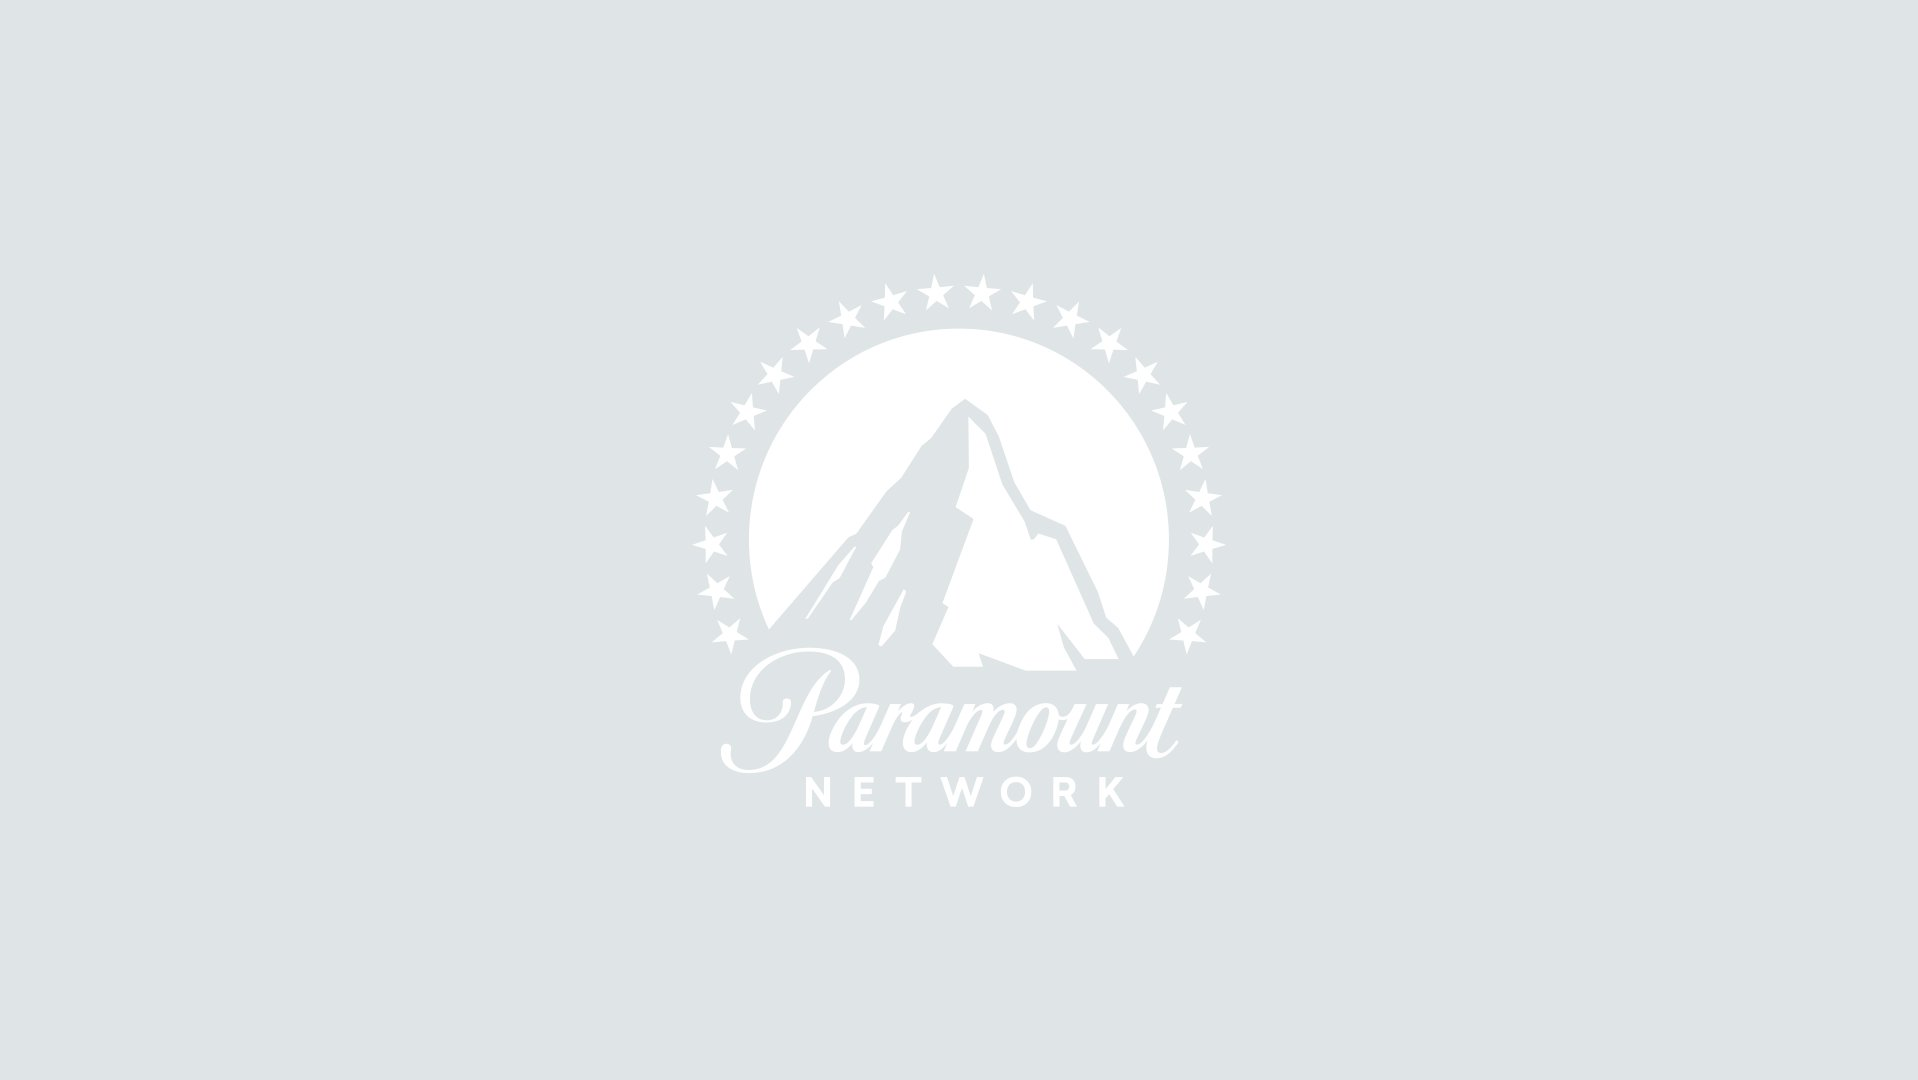 Paramount Network.